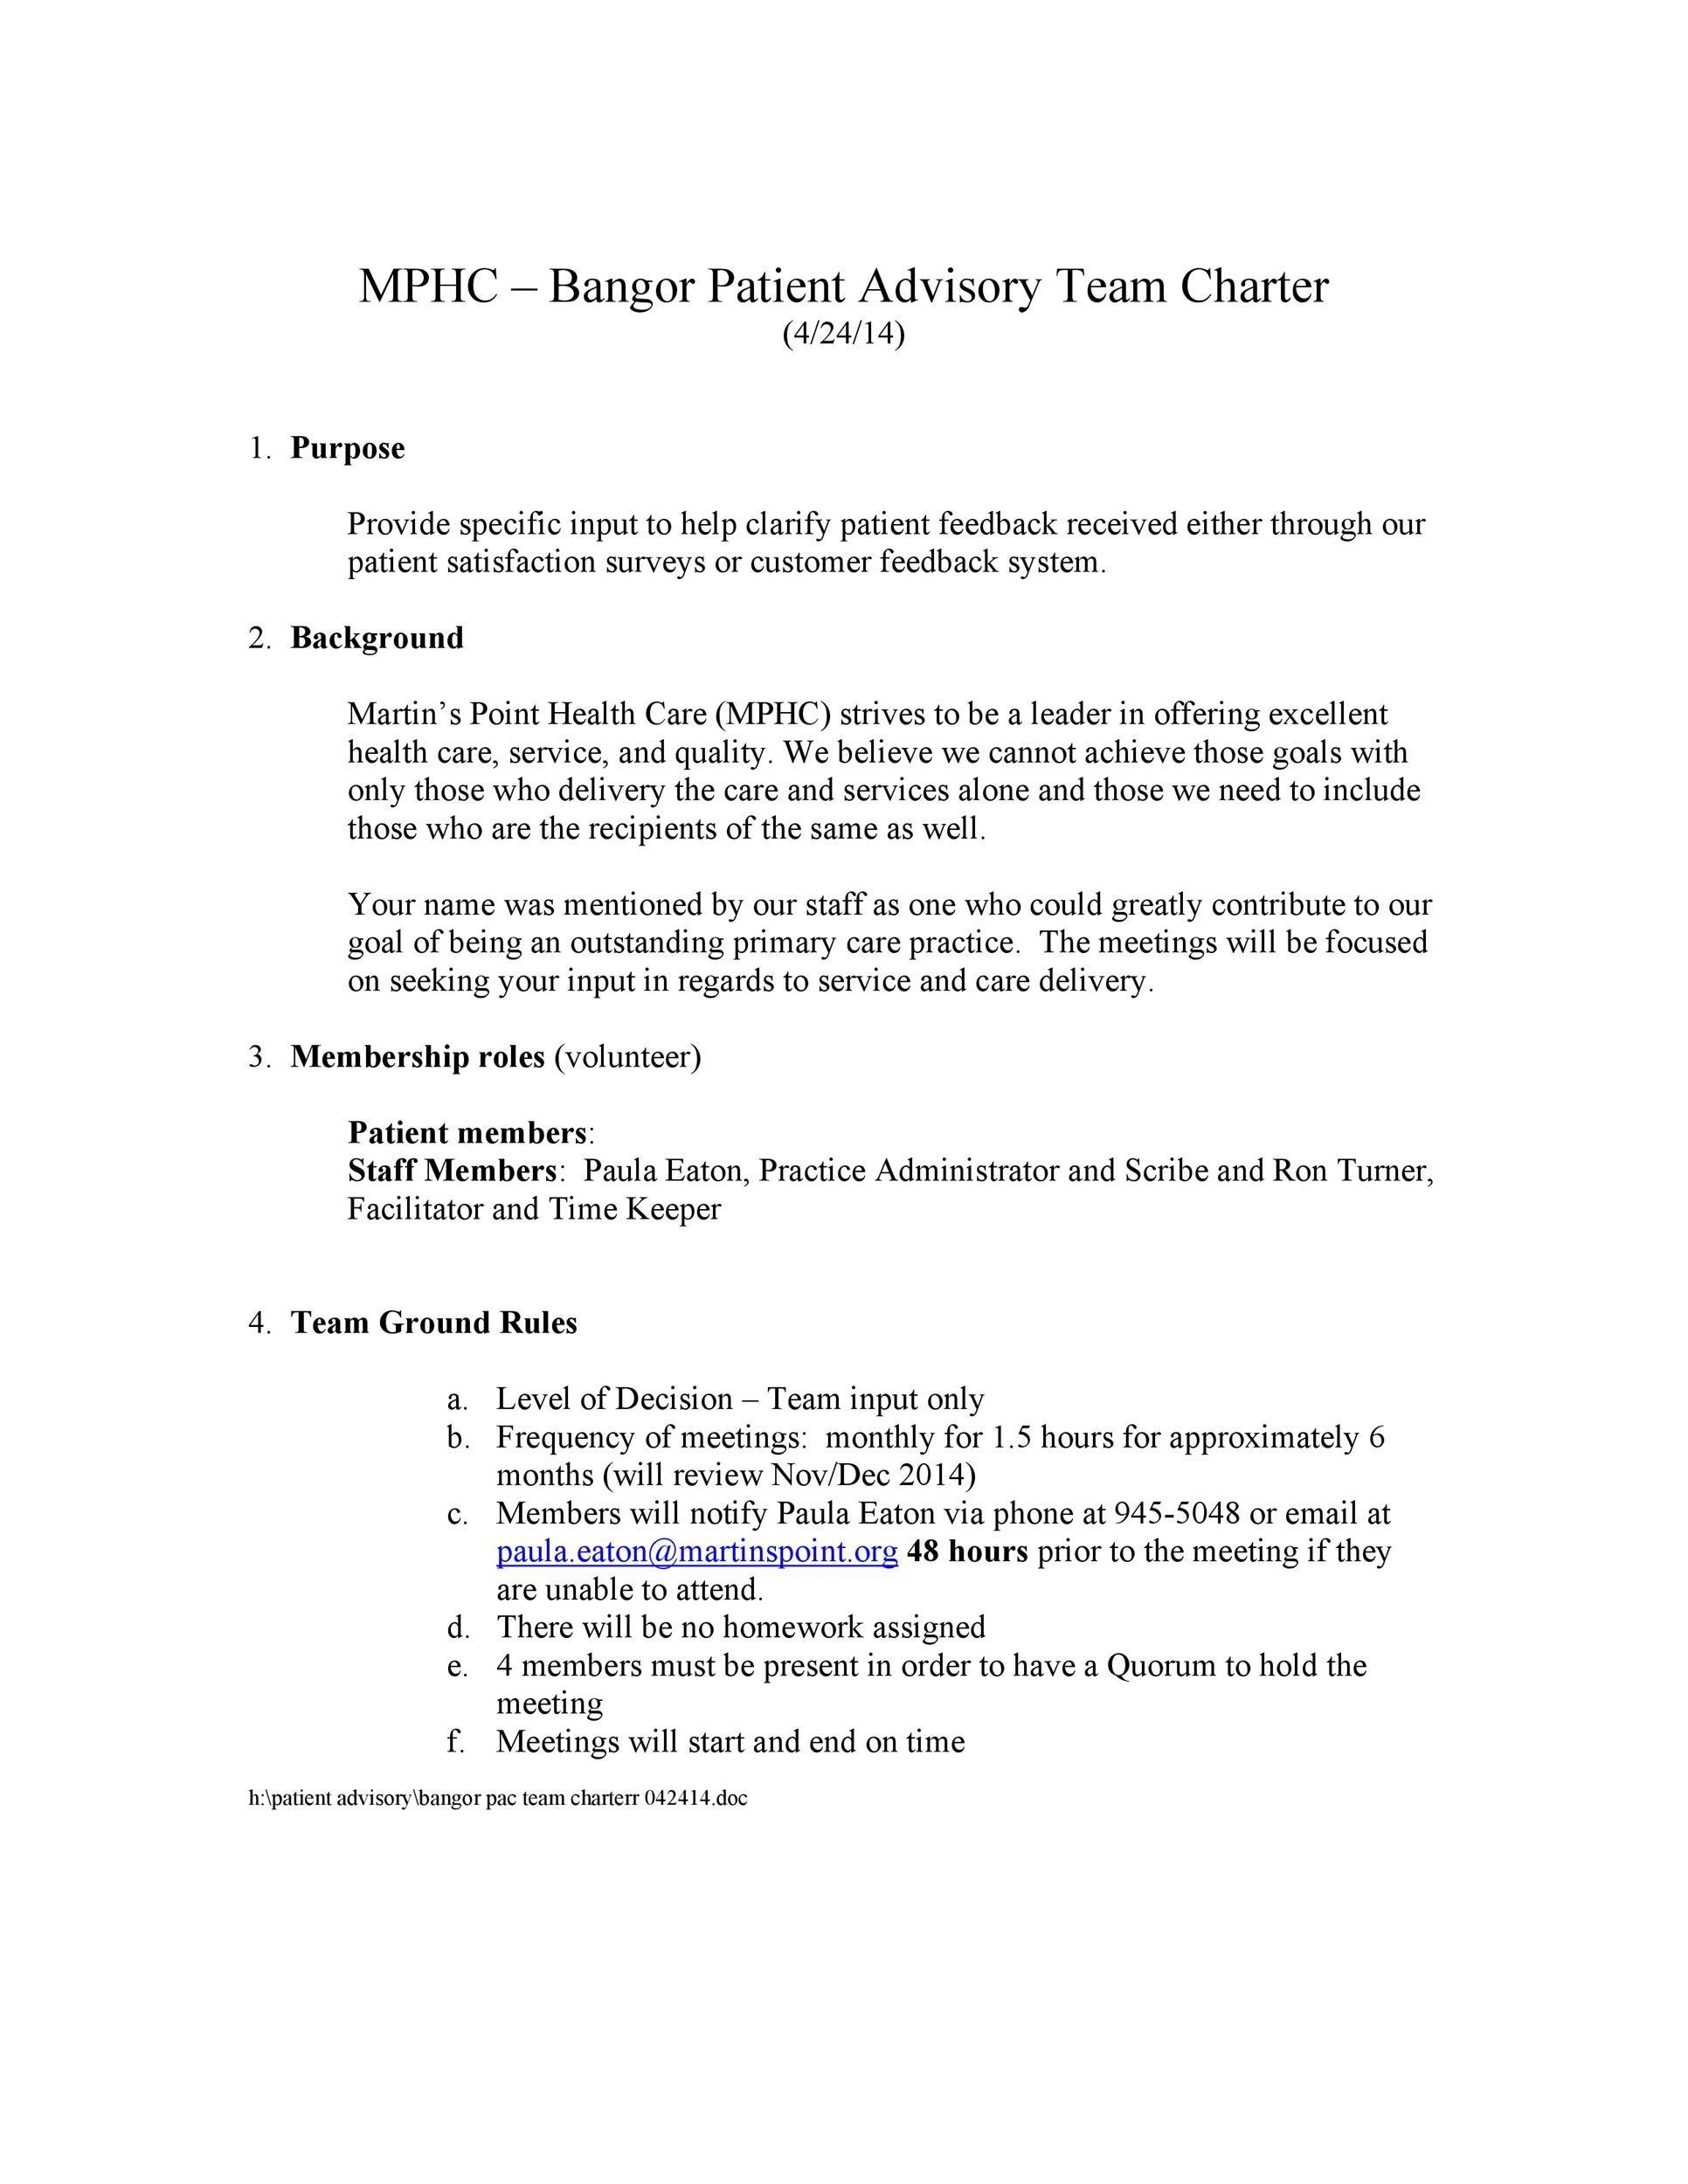 Free team charter template 20